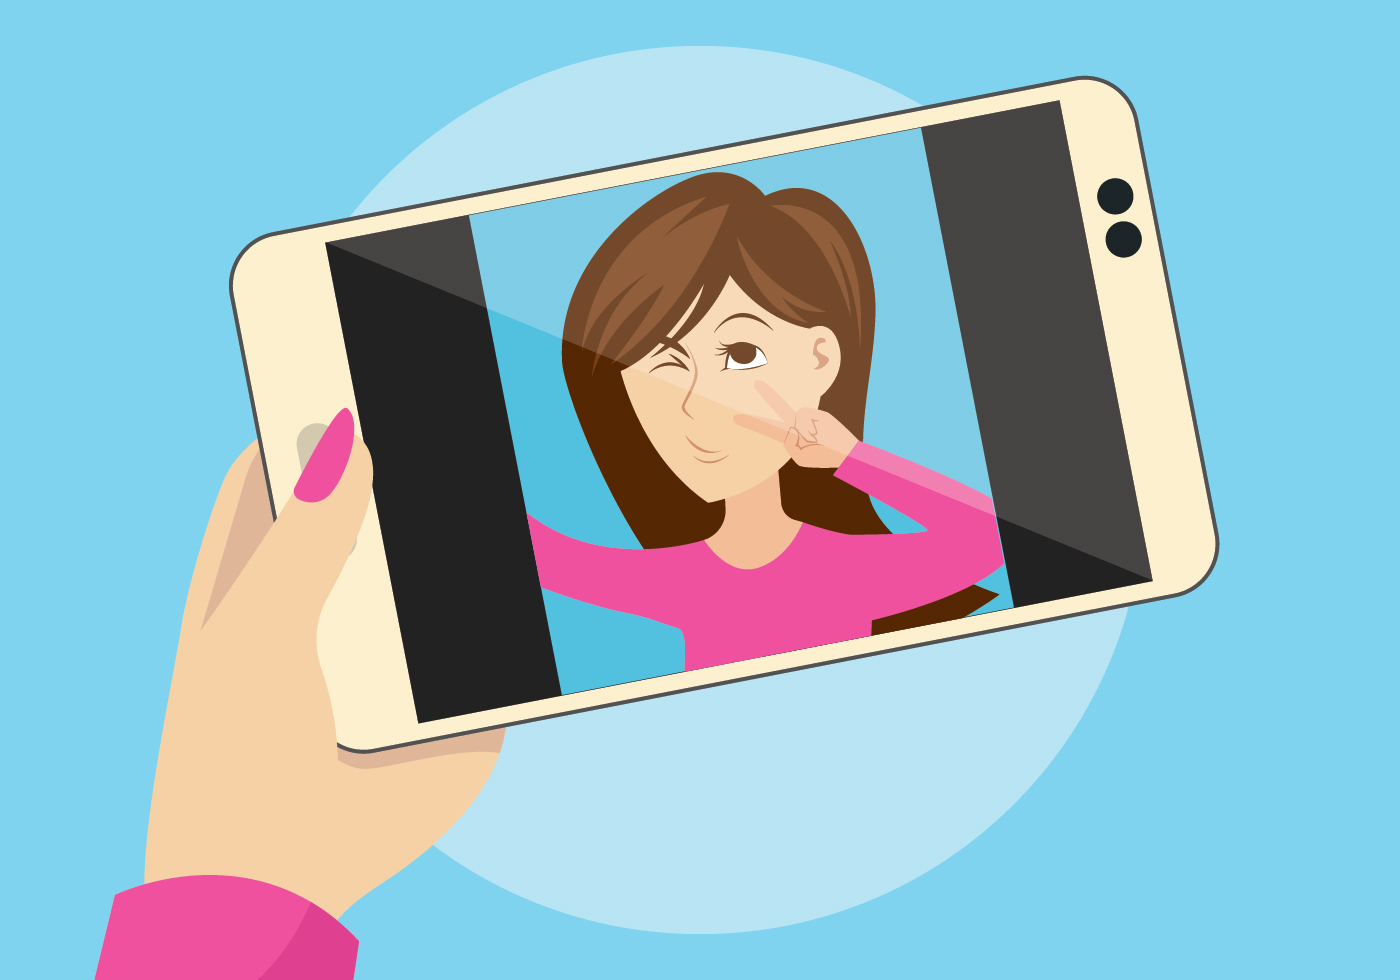 Selfie Vector Illustration - Download Free Vector Art, Stock Graphics  Images-6295